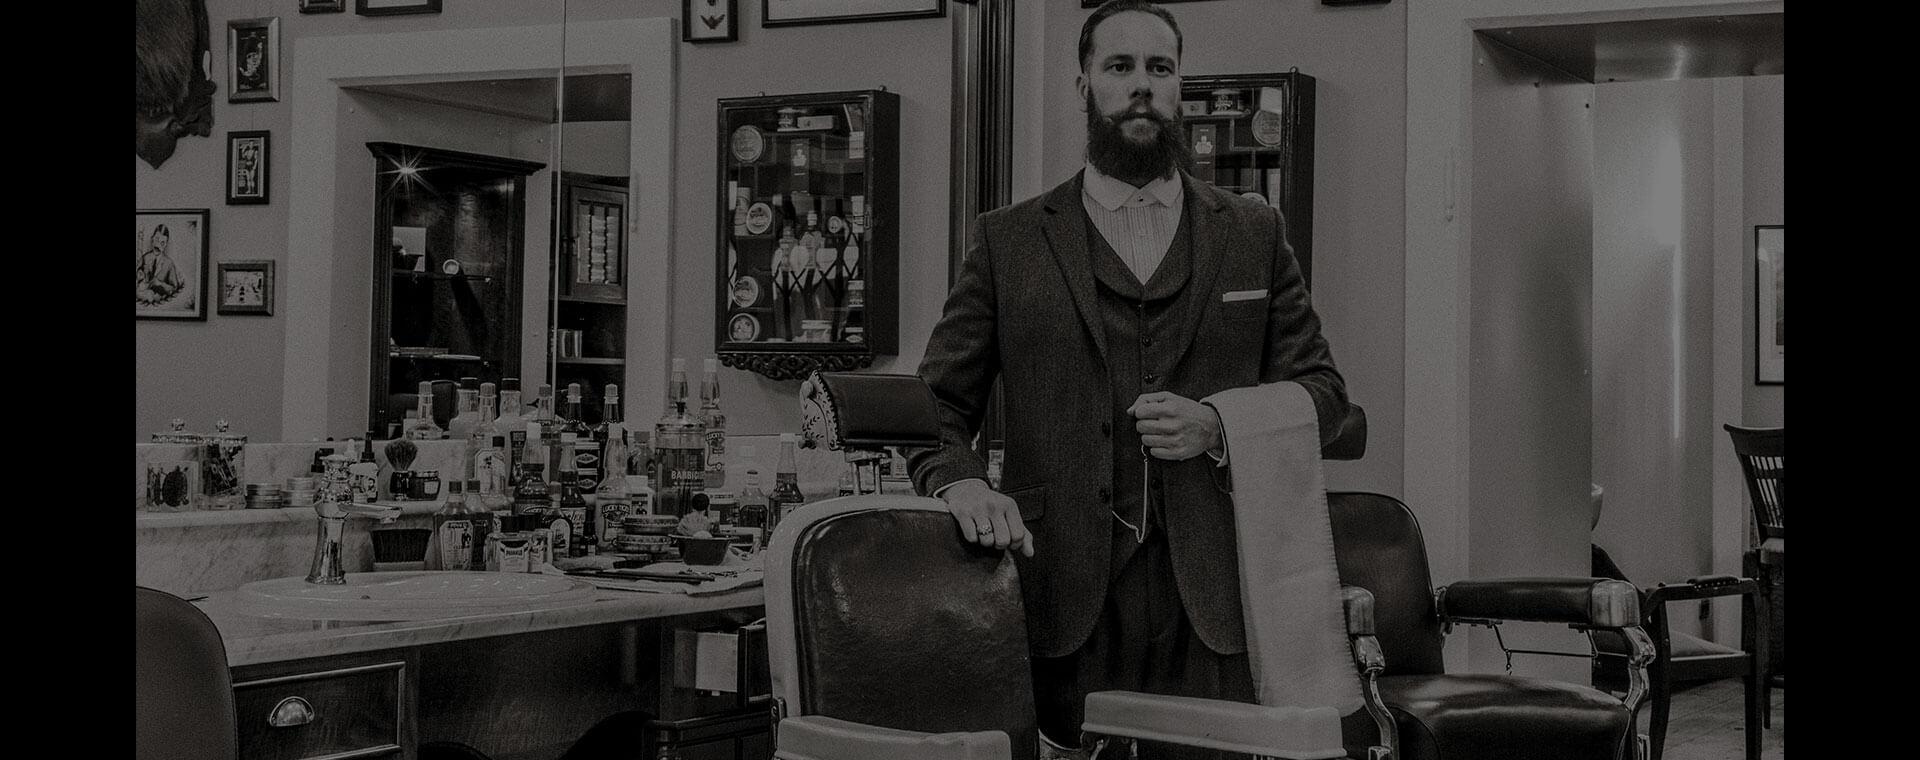 Barbershop Duke Johns Alexander Prasser neben Barberstuhl